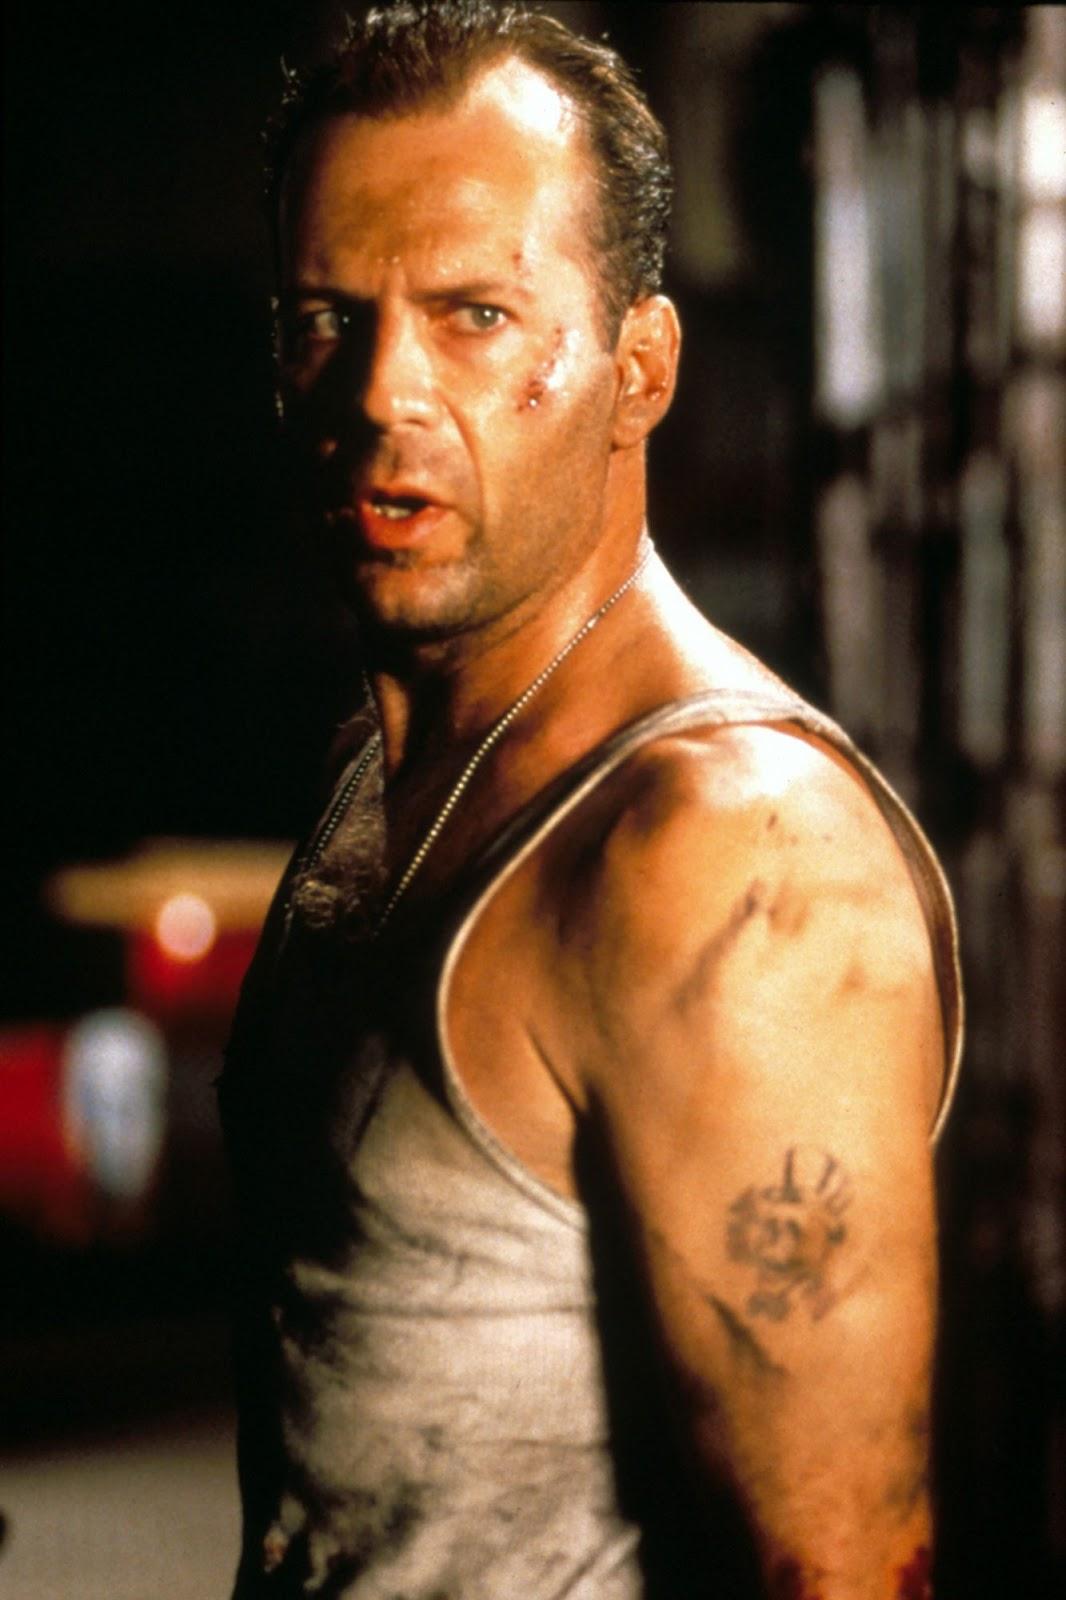 "Bruce Willis เดินทางมาพบช่างสักยอดฝีมือ จากนิวยอร์กซิตี้กับร้าน "" East Side Ink "" 02"